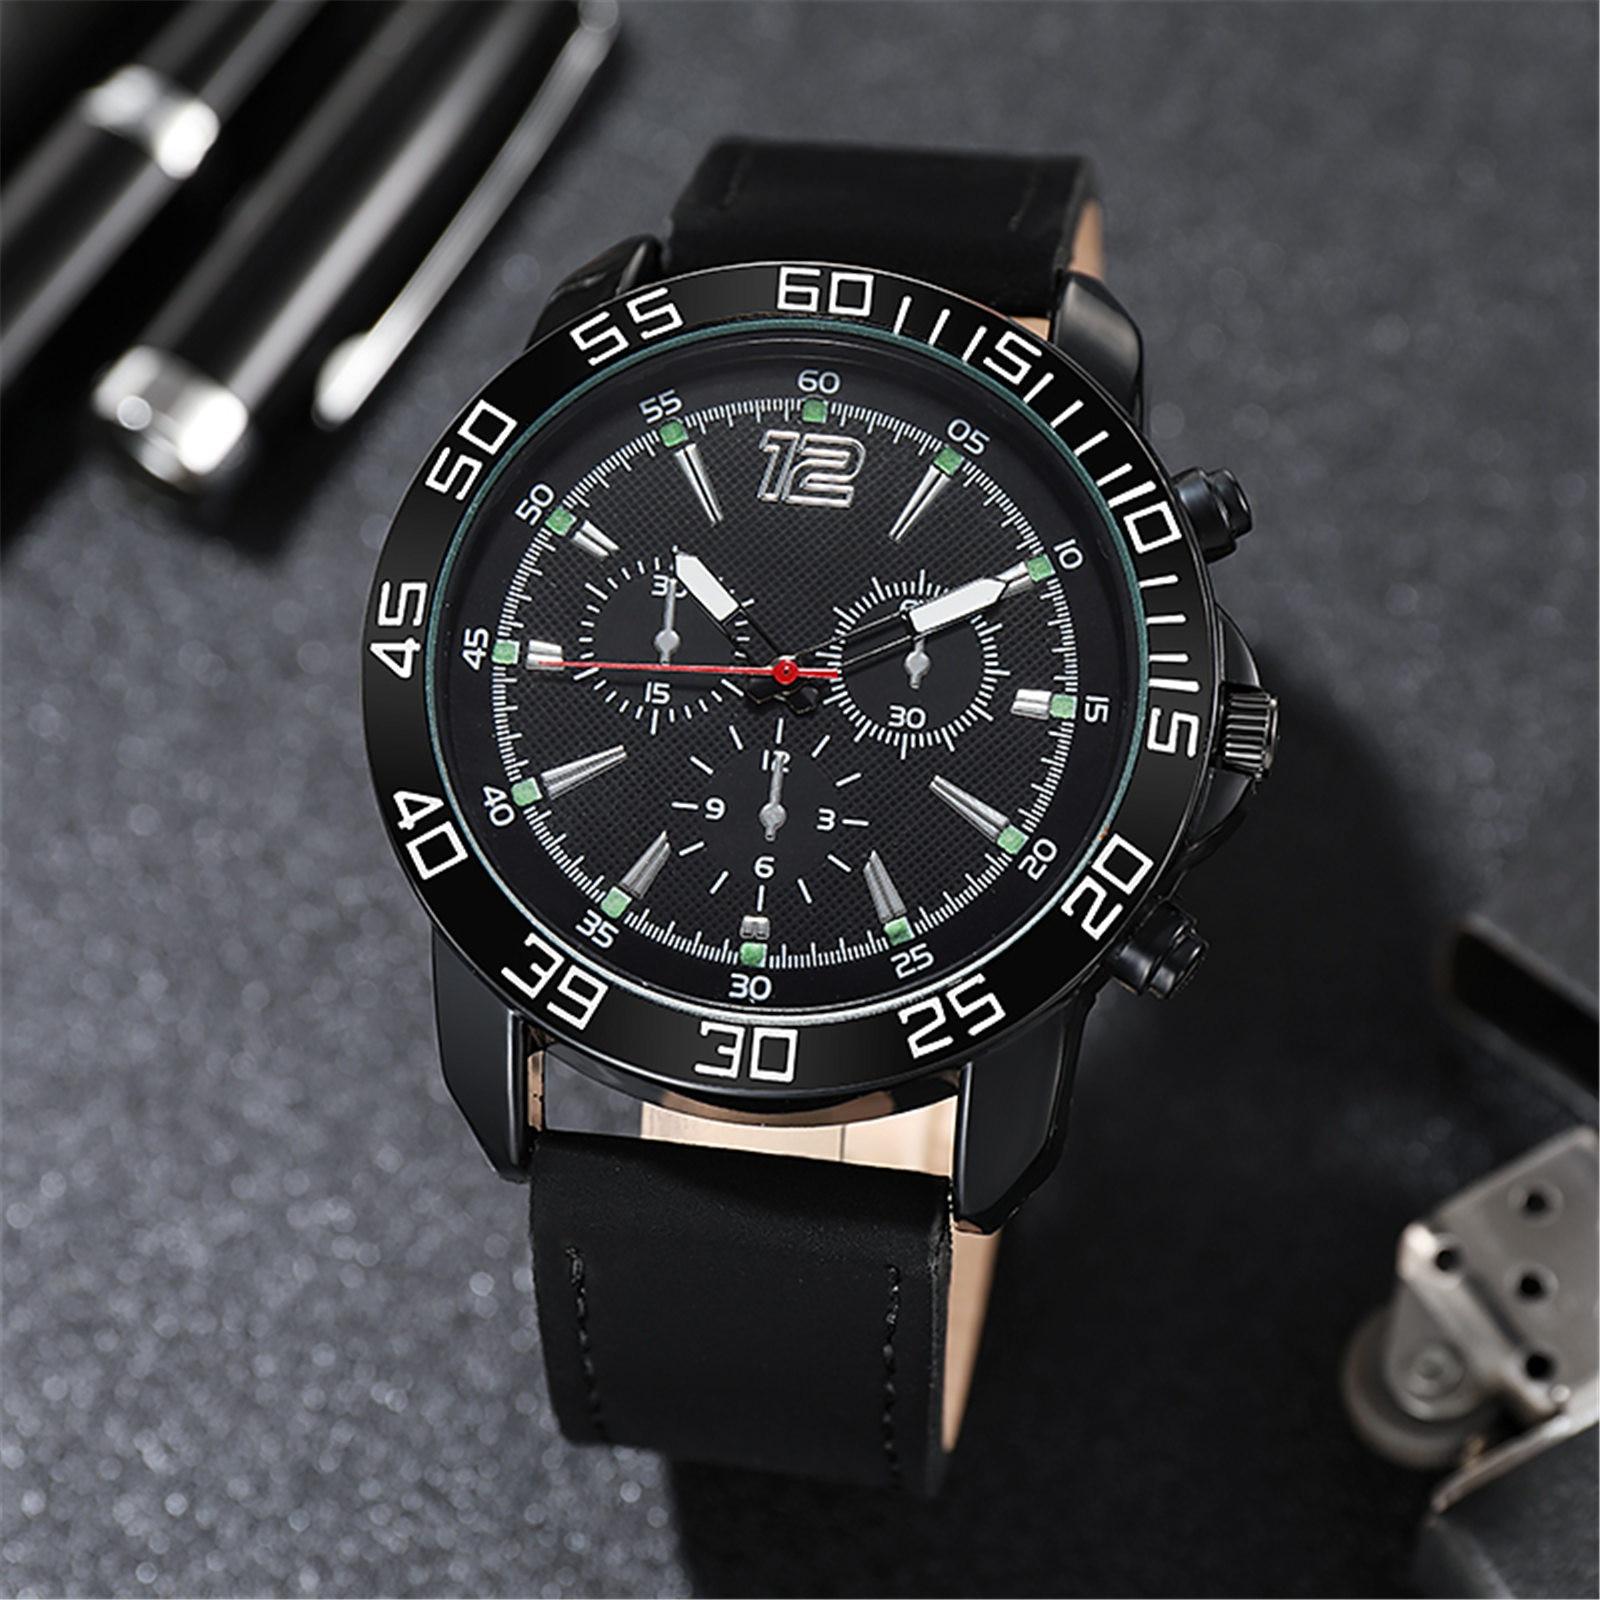 Men's Luminous Watches Outdoor Multi-function Electronic Watch Fashion Quartz Watches For Men Час